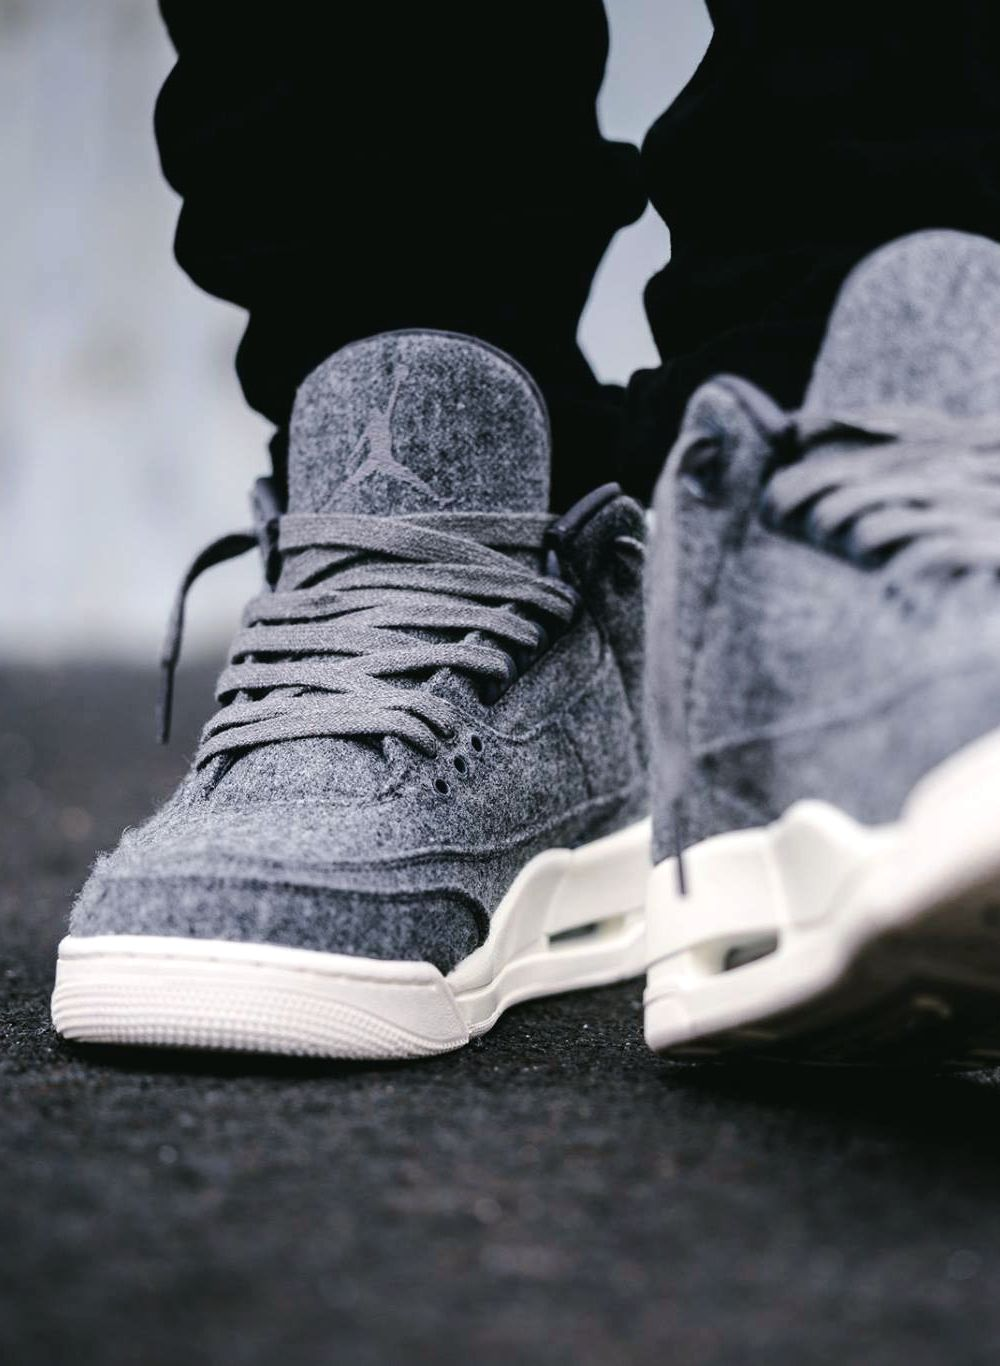 c879beb82cc Air Jordan 3 Retro  Wool  (via Kicks-daily.com) Release December 17 ...